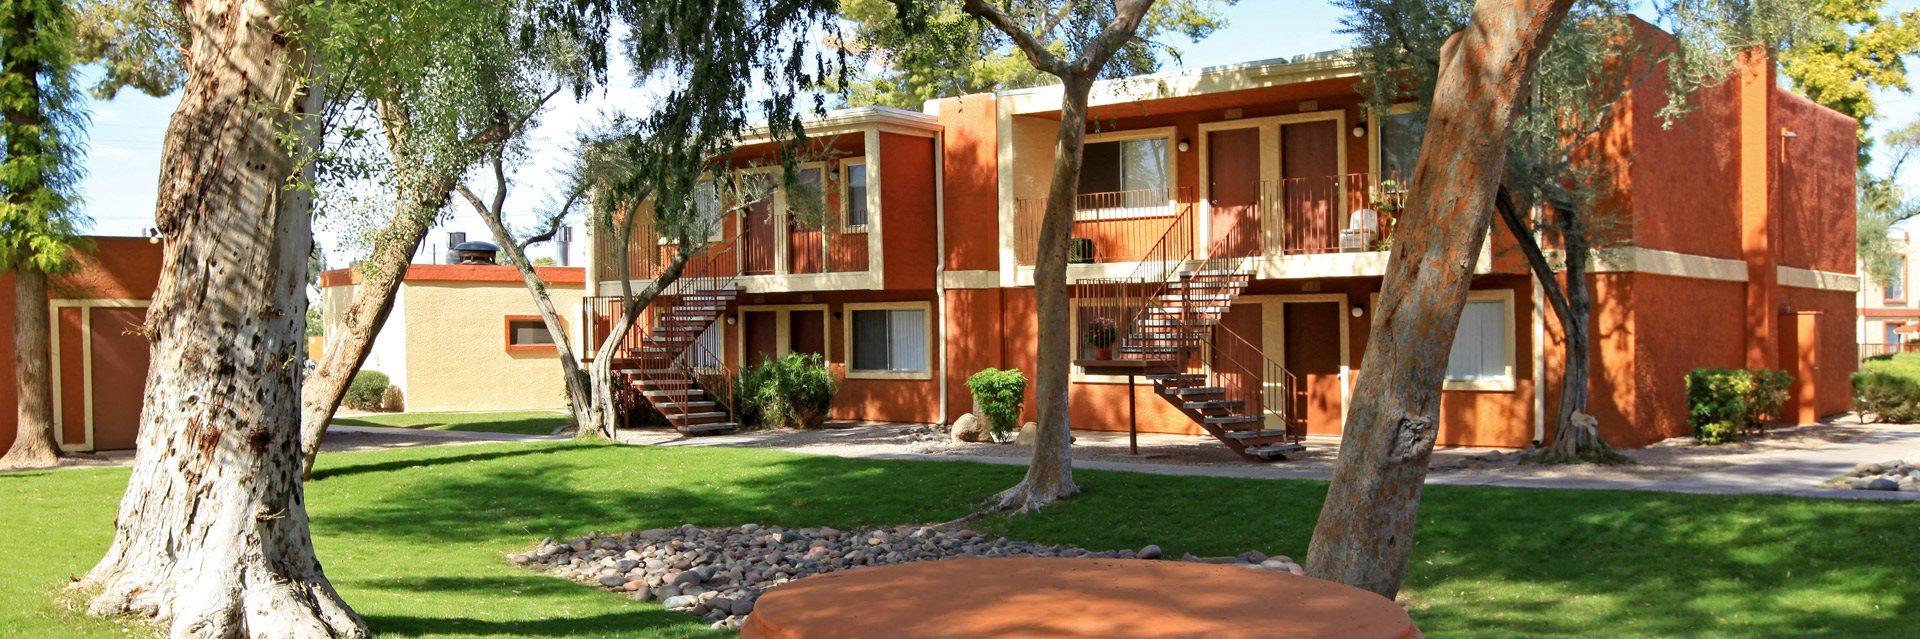 Photos and Video of La Terraza in Phoenix, AZ